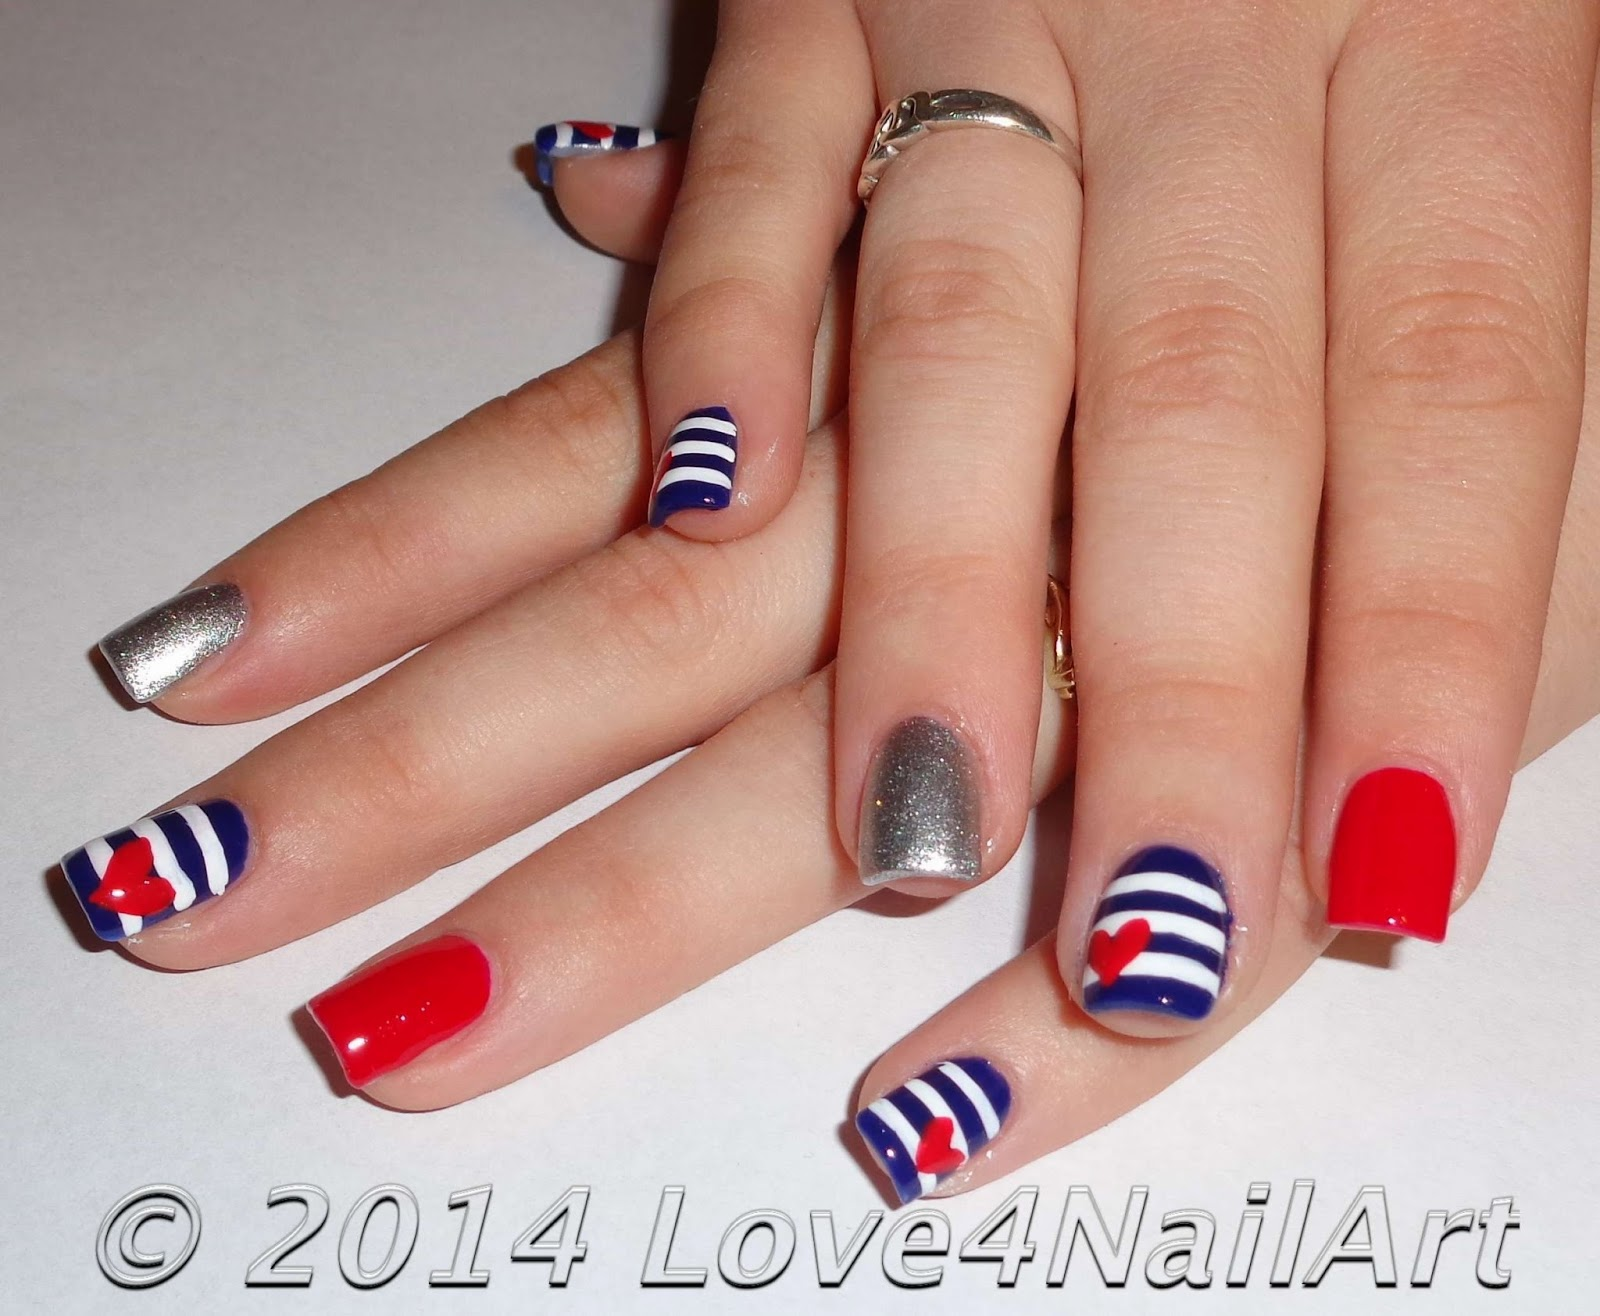 Love4nailart Patriotic Nails With A Girly Twist Memorial Day Nails